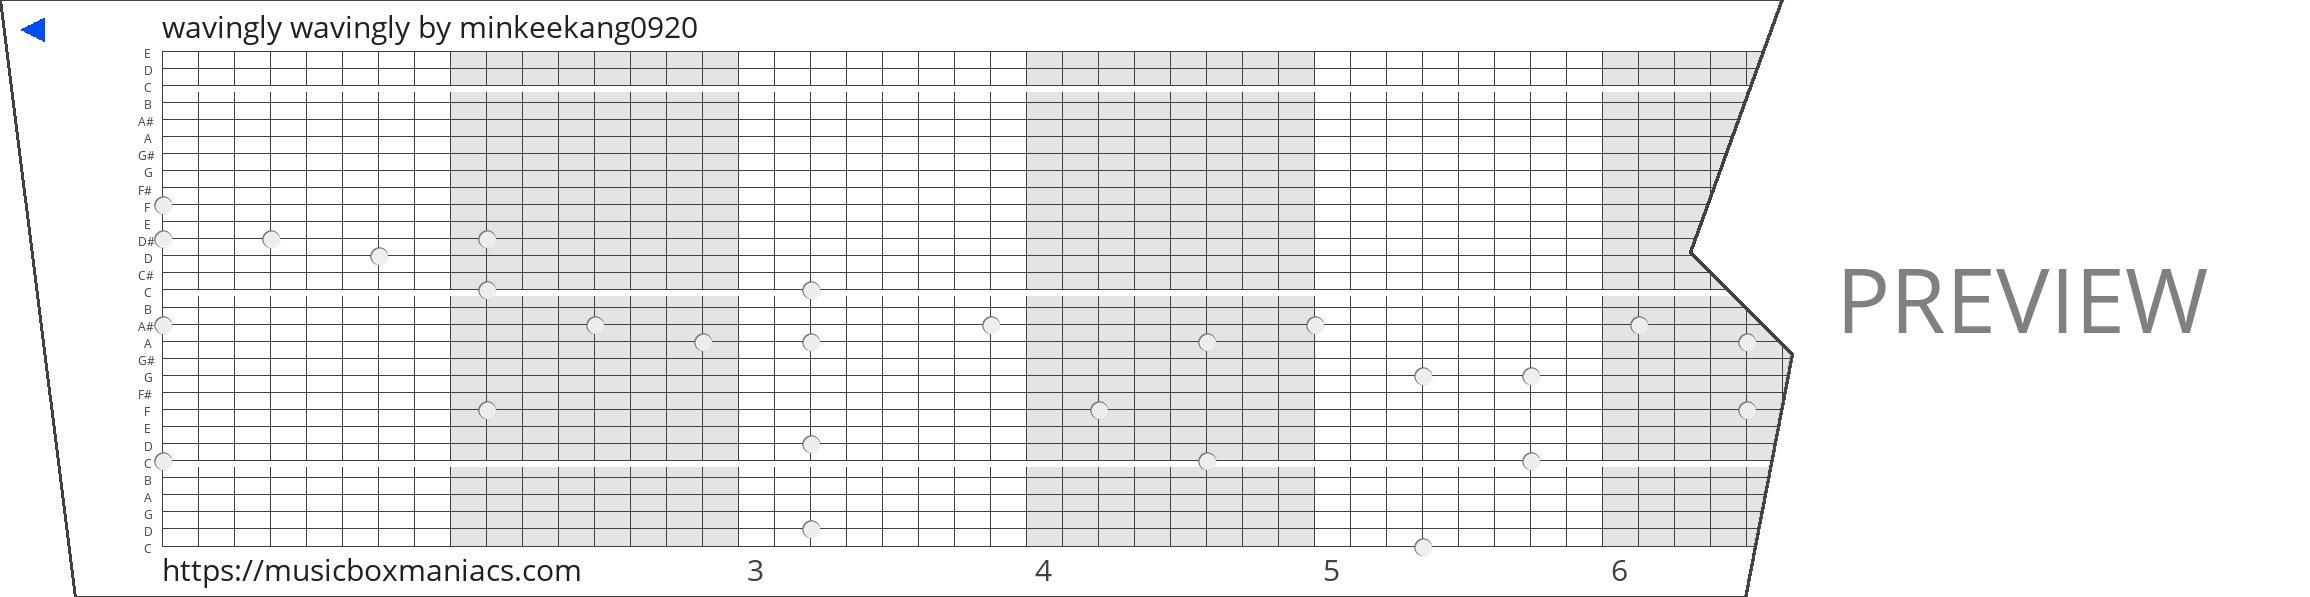 wavingly wavingly 30 note music box paper strip